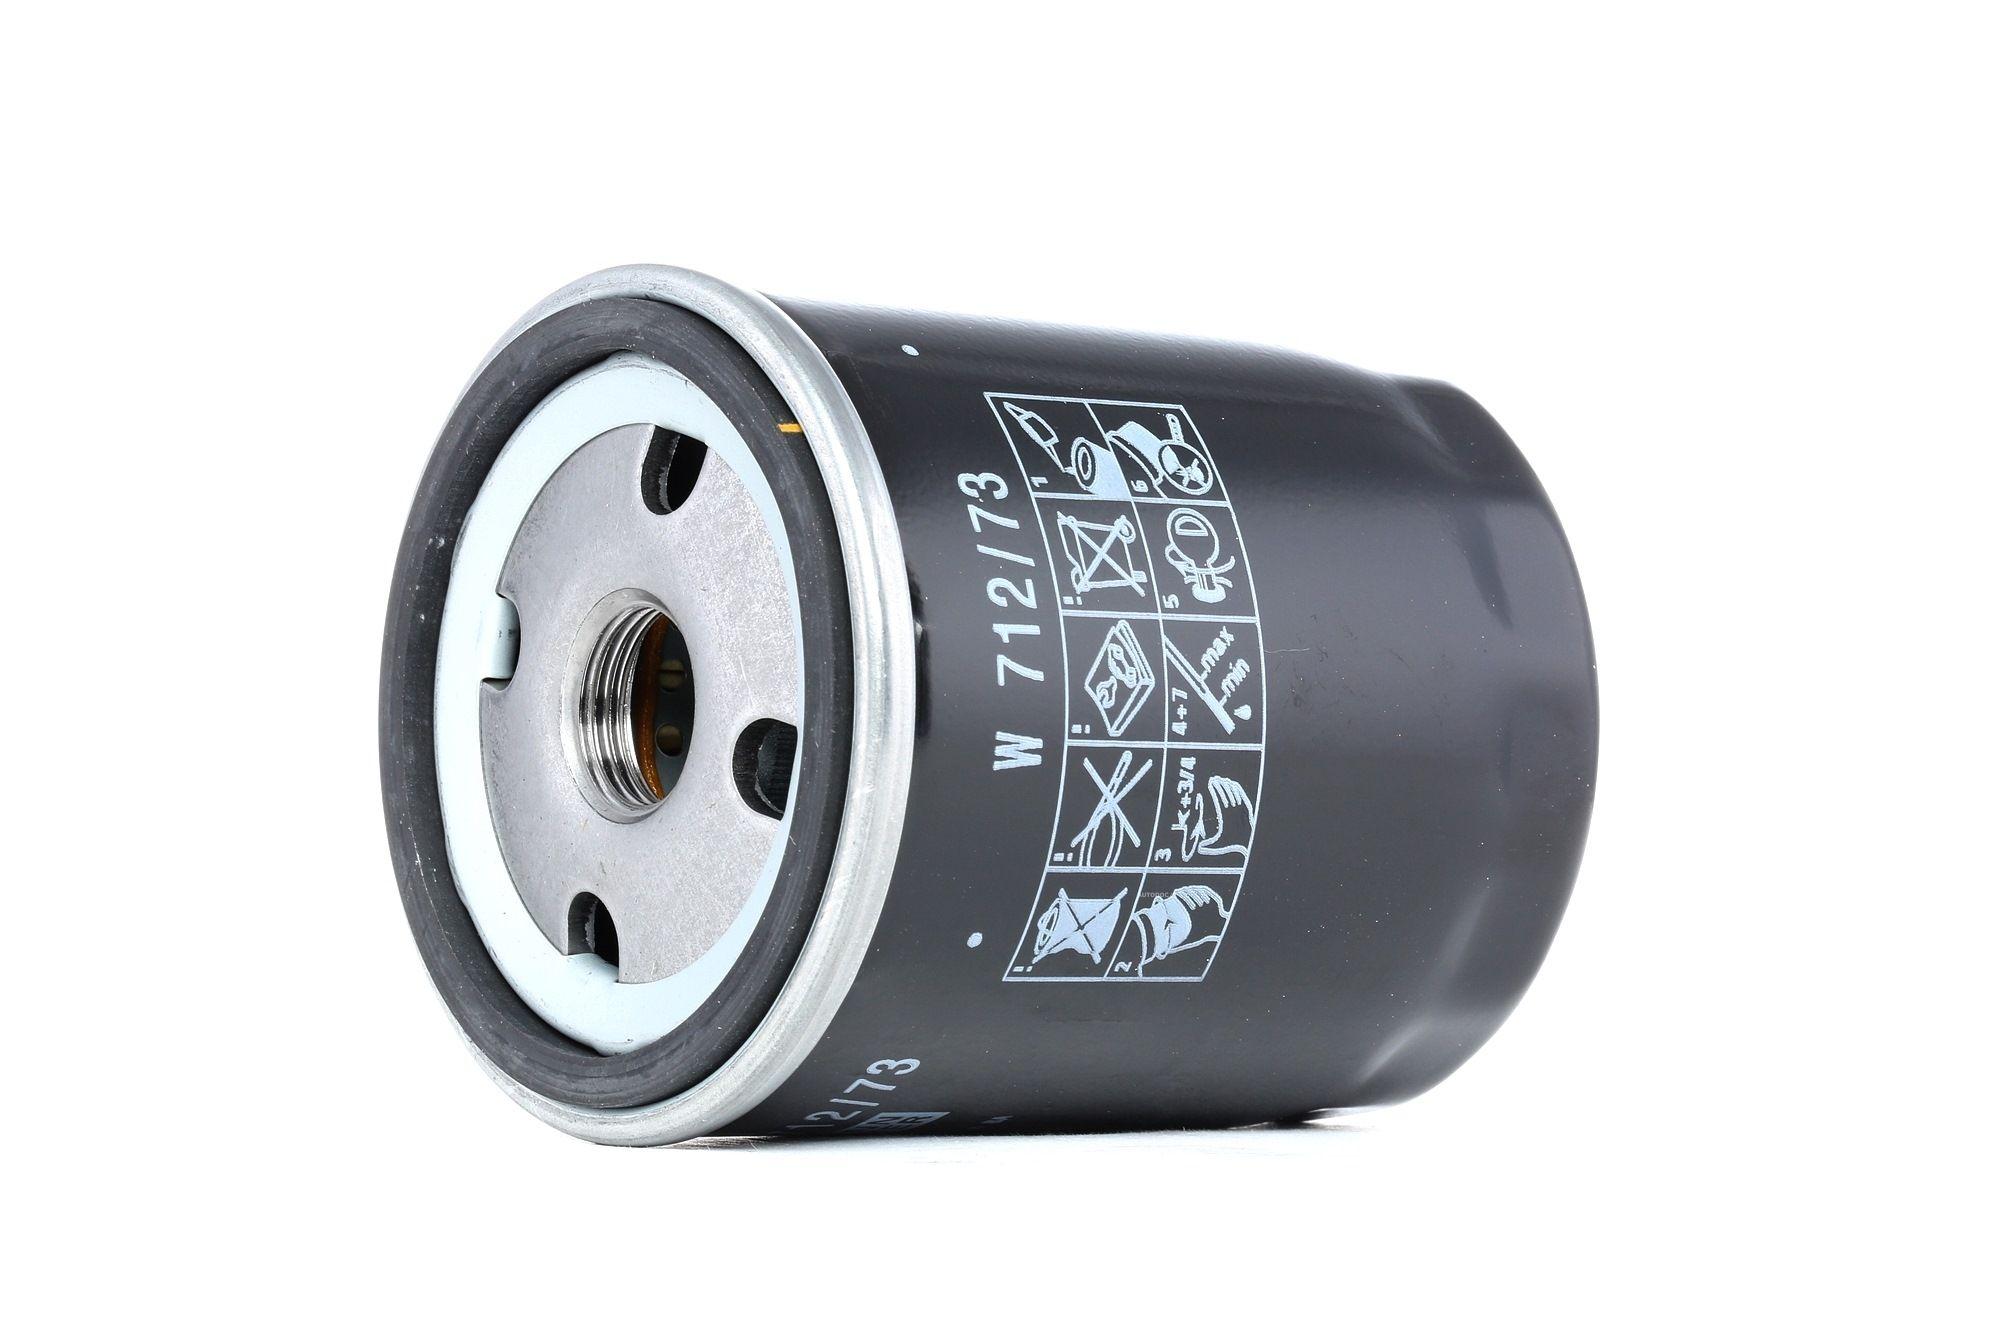 MANN-FILTER: Original Autofilter W 712/73 (Innendurchmesser 2: 62mm, Innendurchmesser 2: 62mm, Ø: 76mm, Außendurchmesser 2: 71mm, Höhe: 93mm)